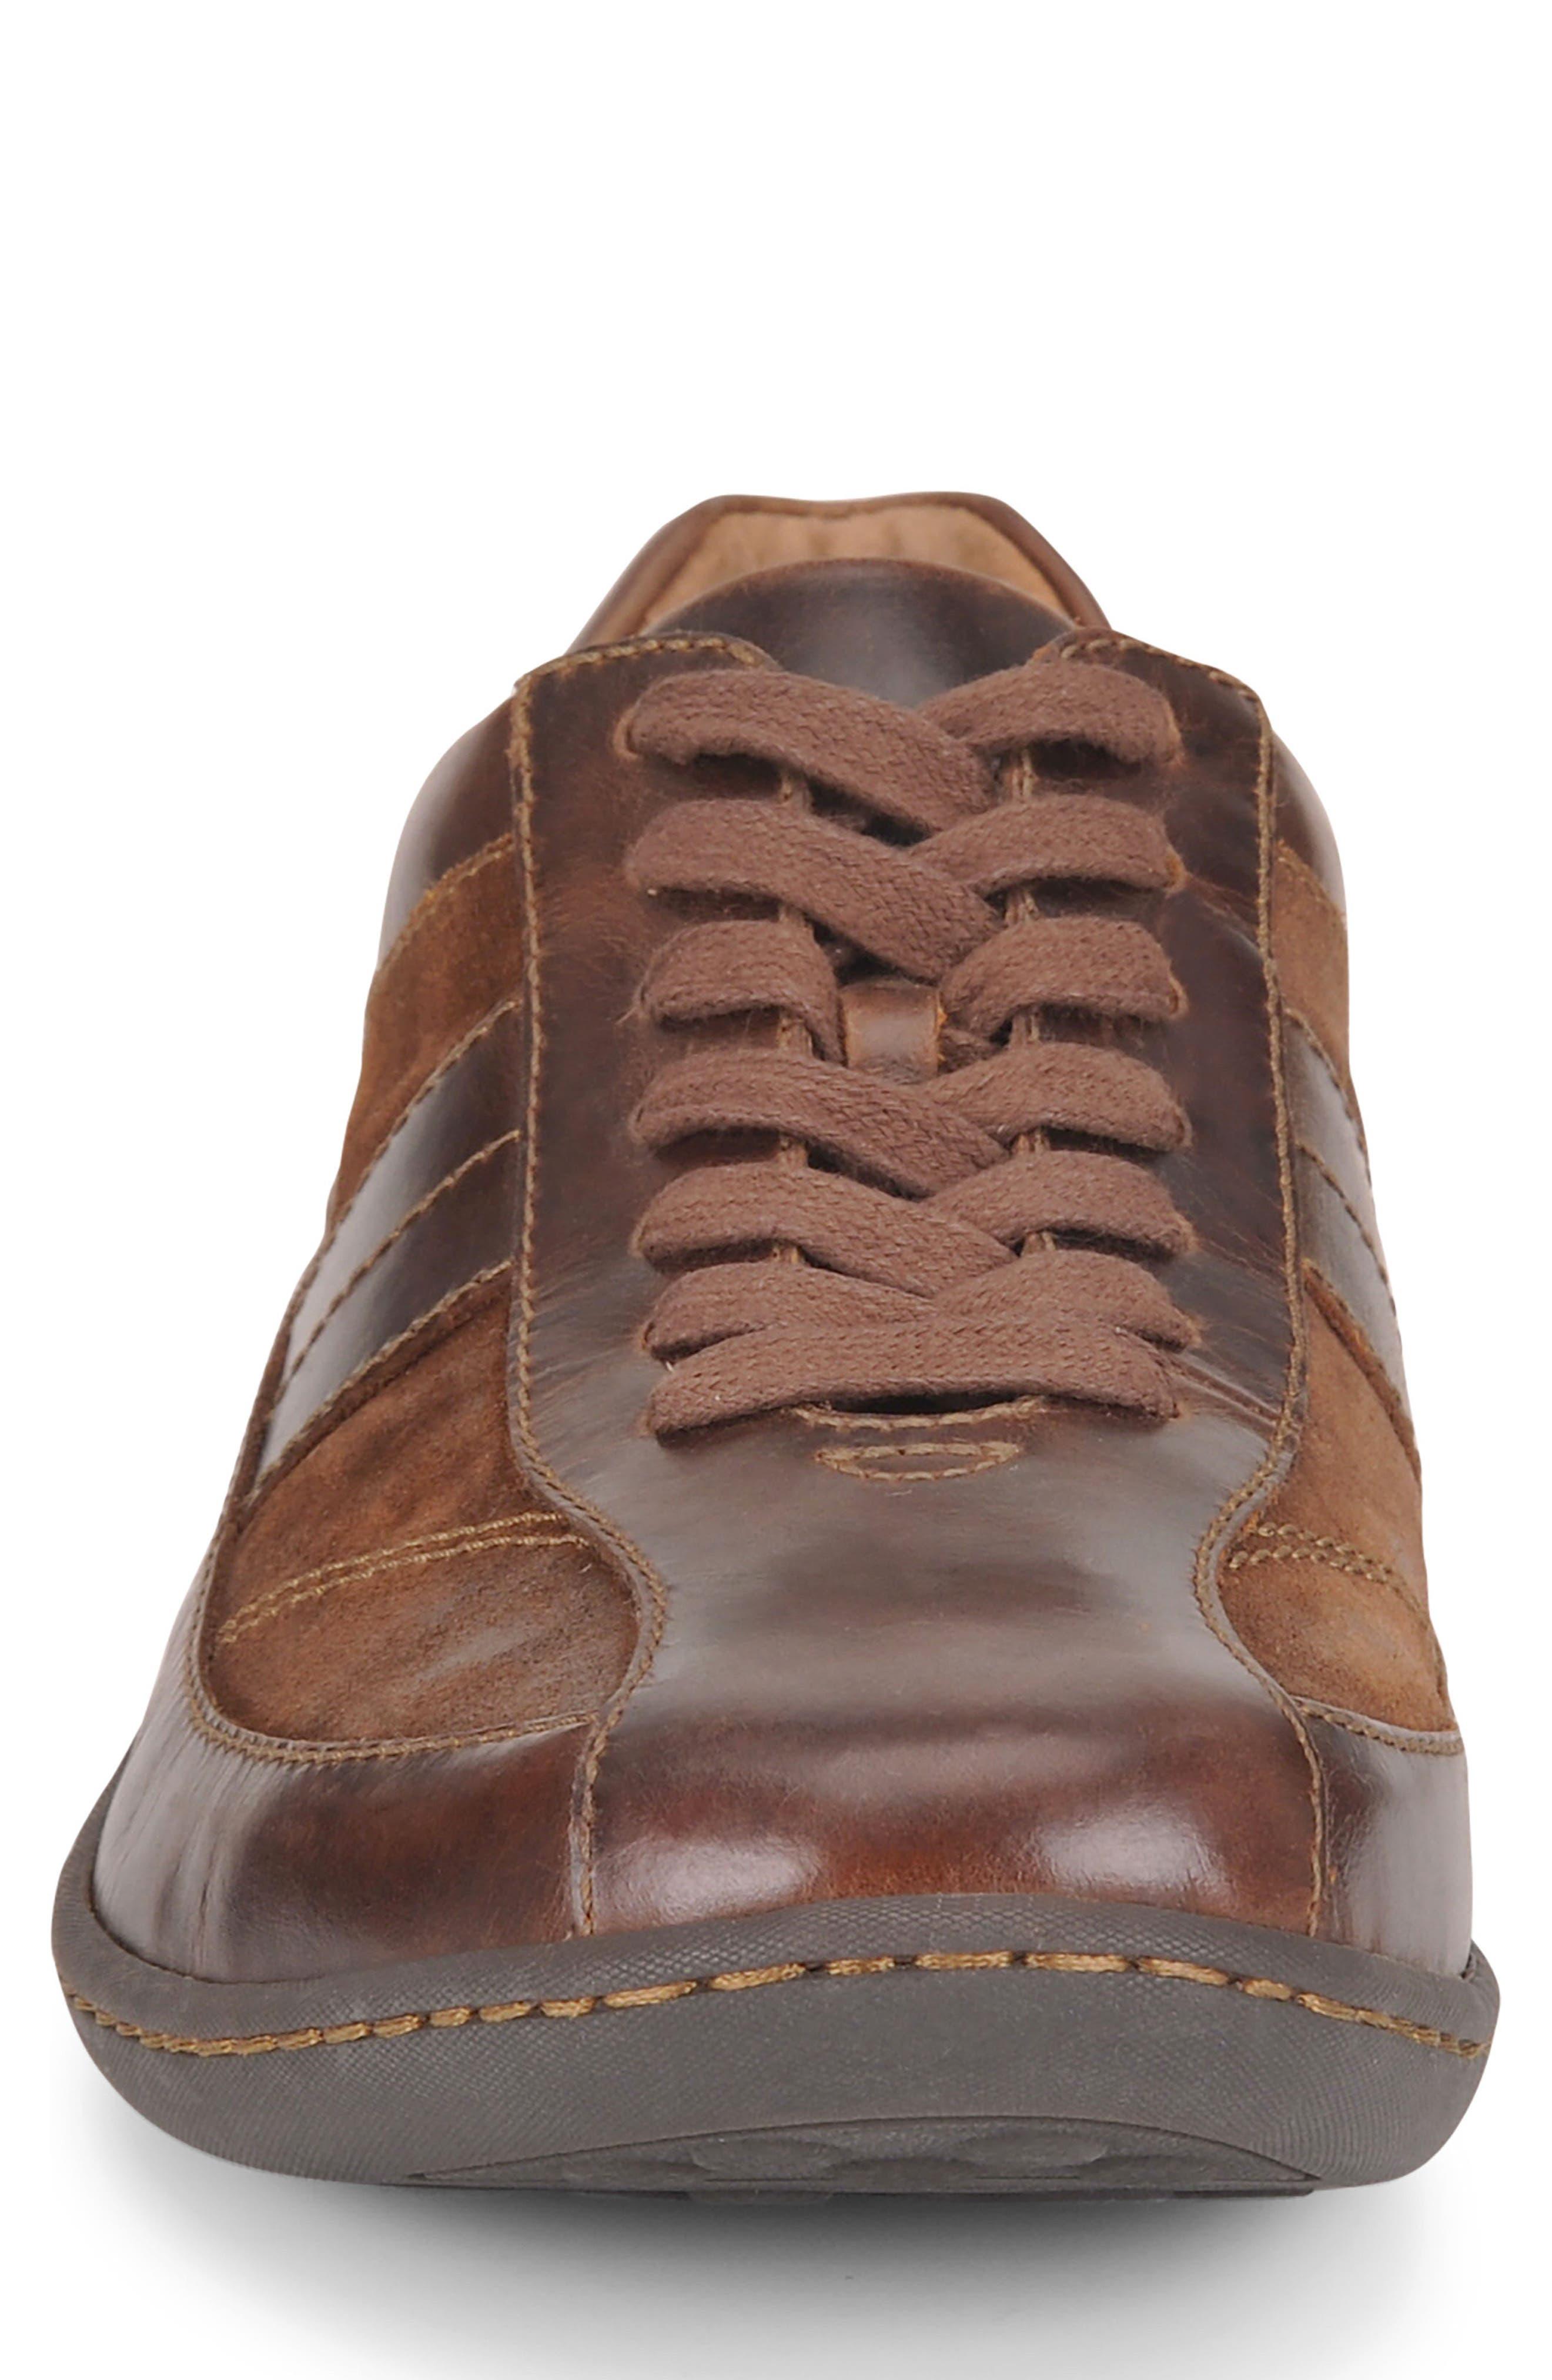 BØRN,                             Breves Low Top Sneaker,                             Alternate thumbnail 4, color,                             230